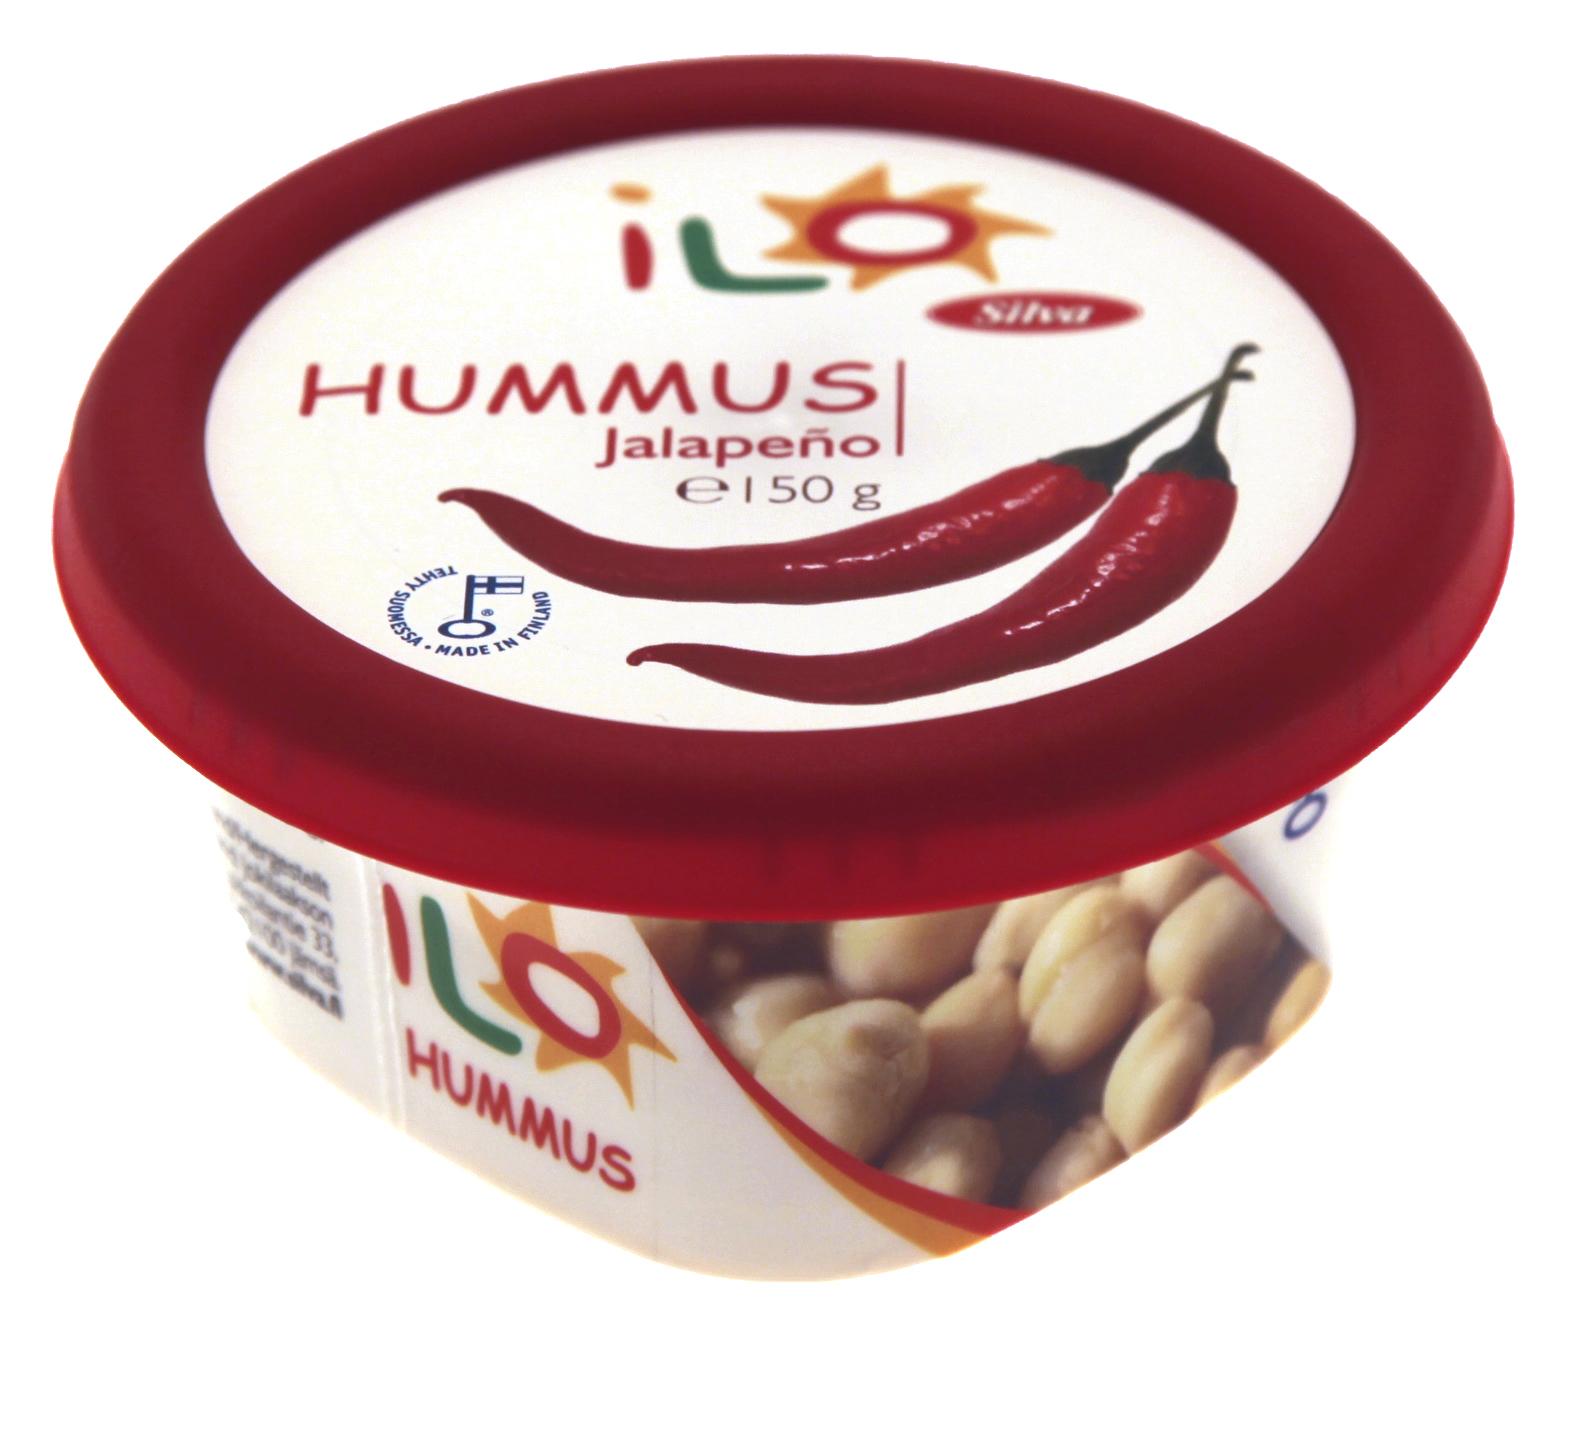 ILO Hummus Jalapeno